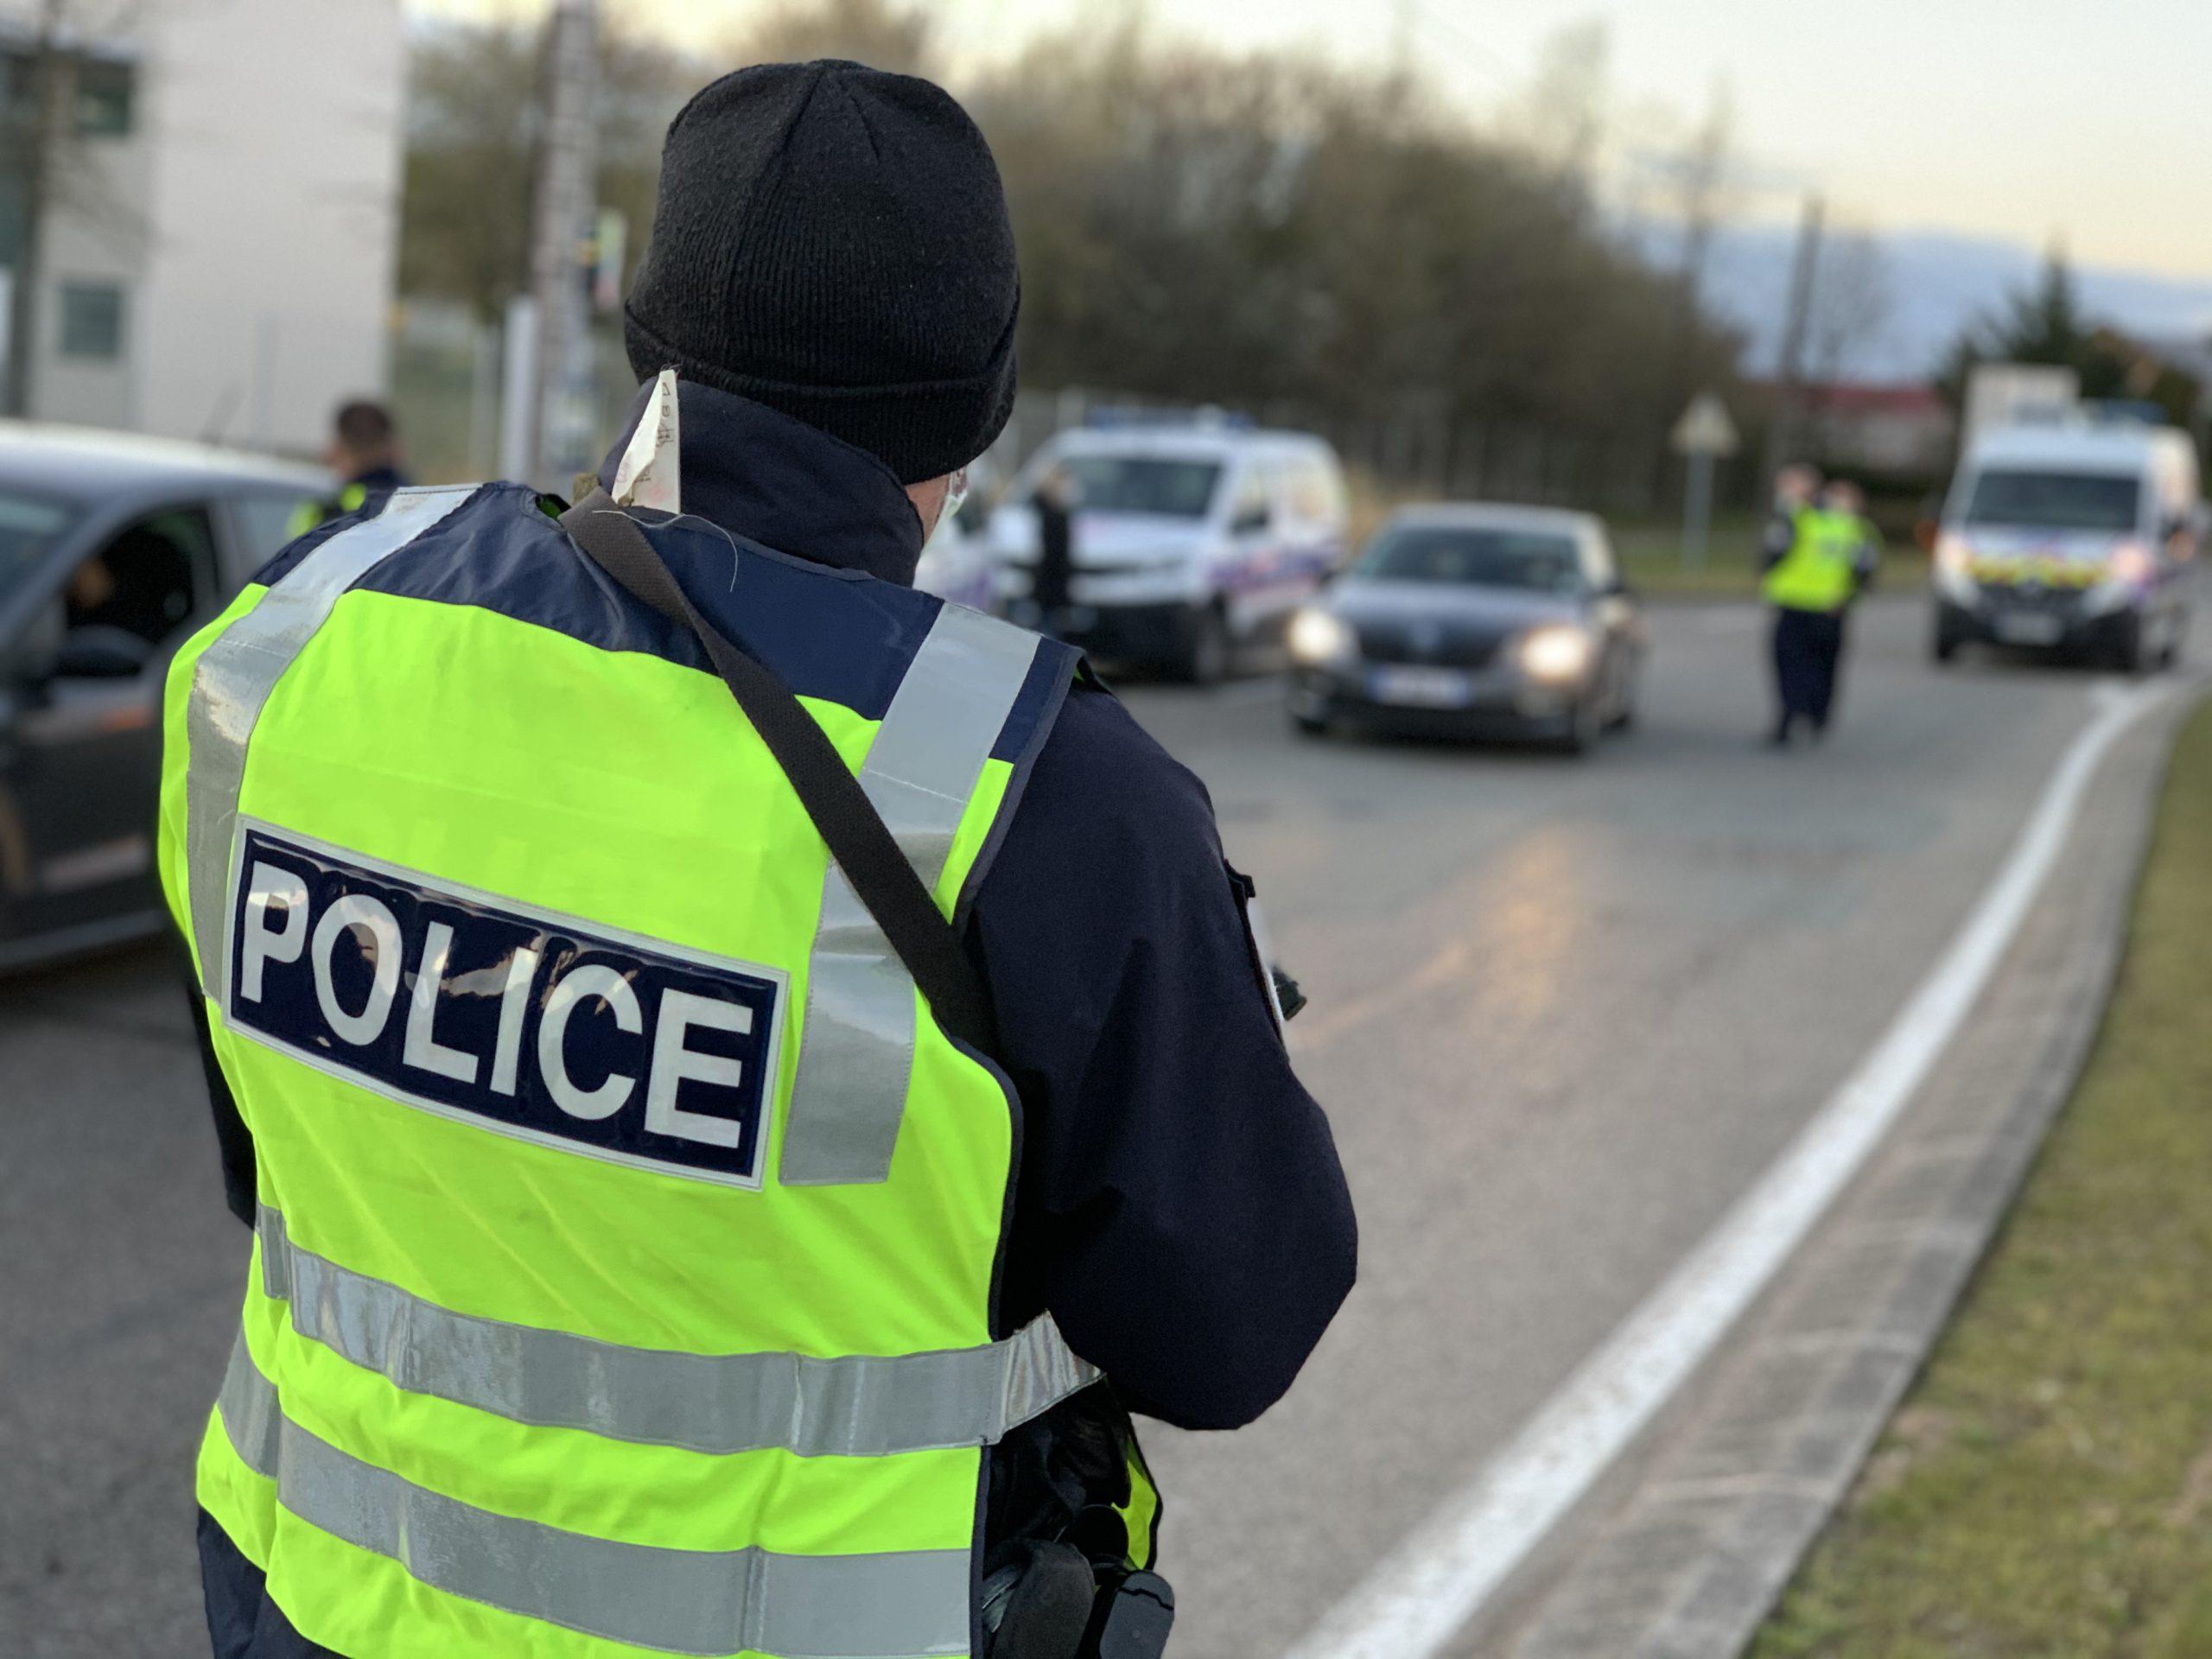 Le commissariat de police de Belfort va accueillir 5 policiers supplémentaires dans ses effectifs.